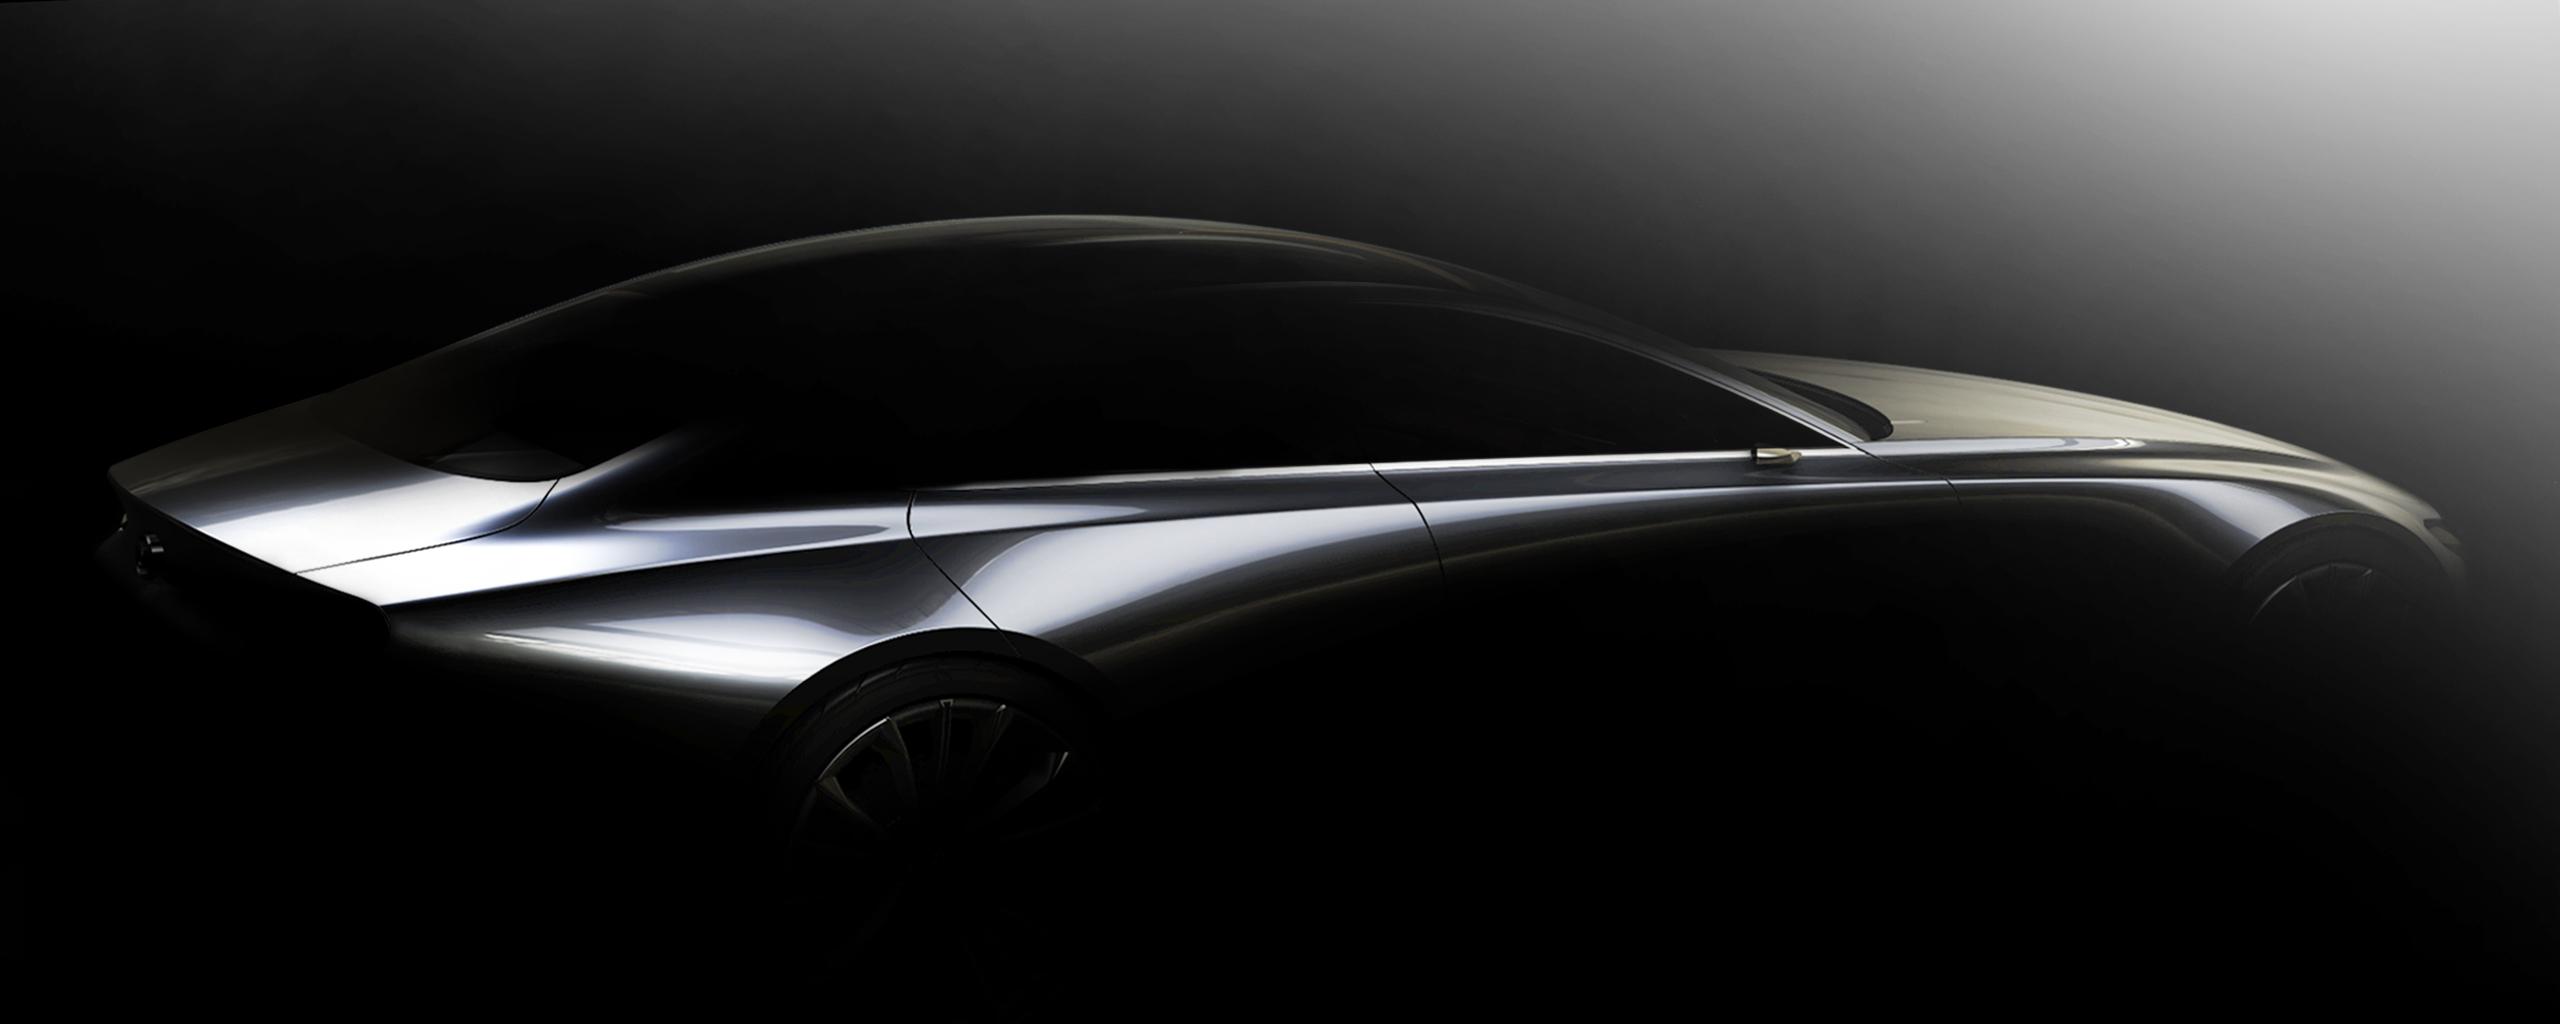 Next-generation design vision